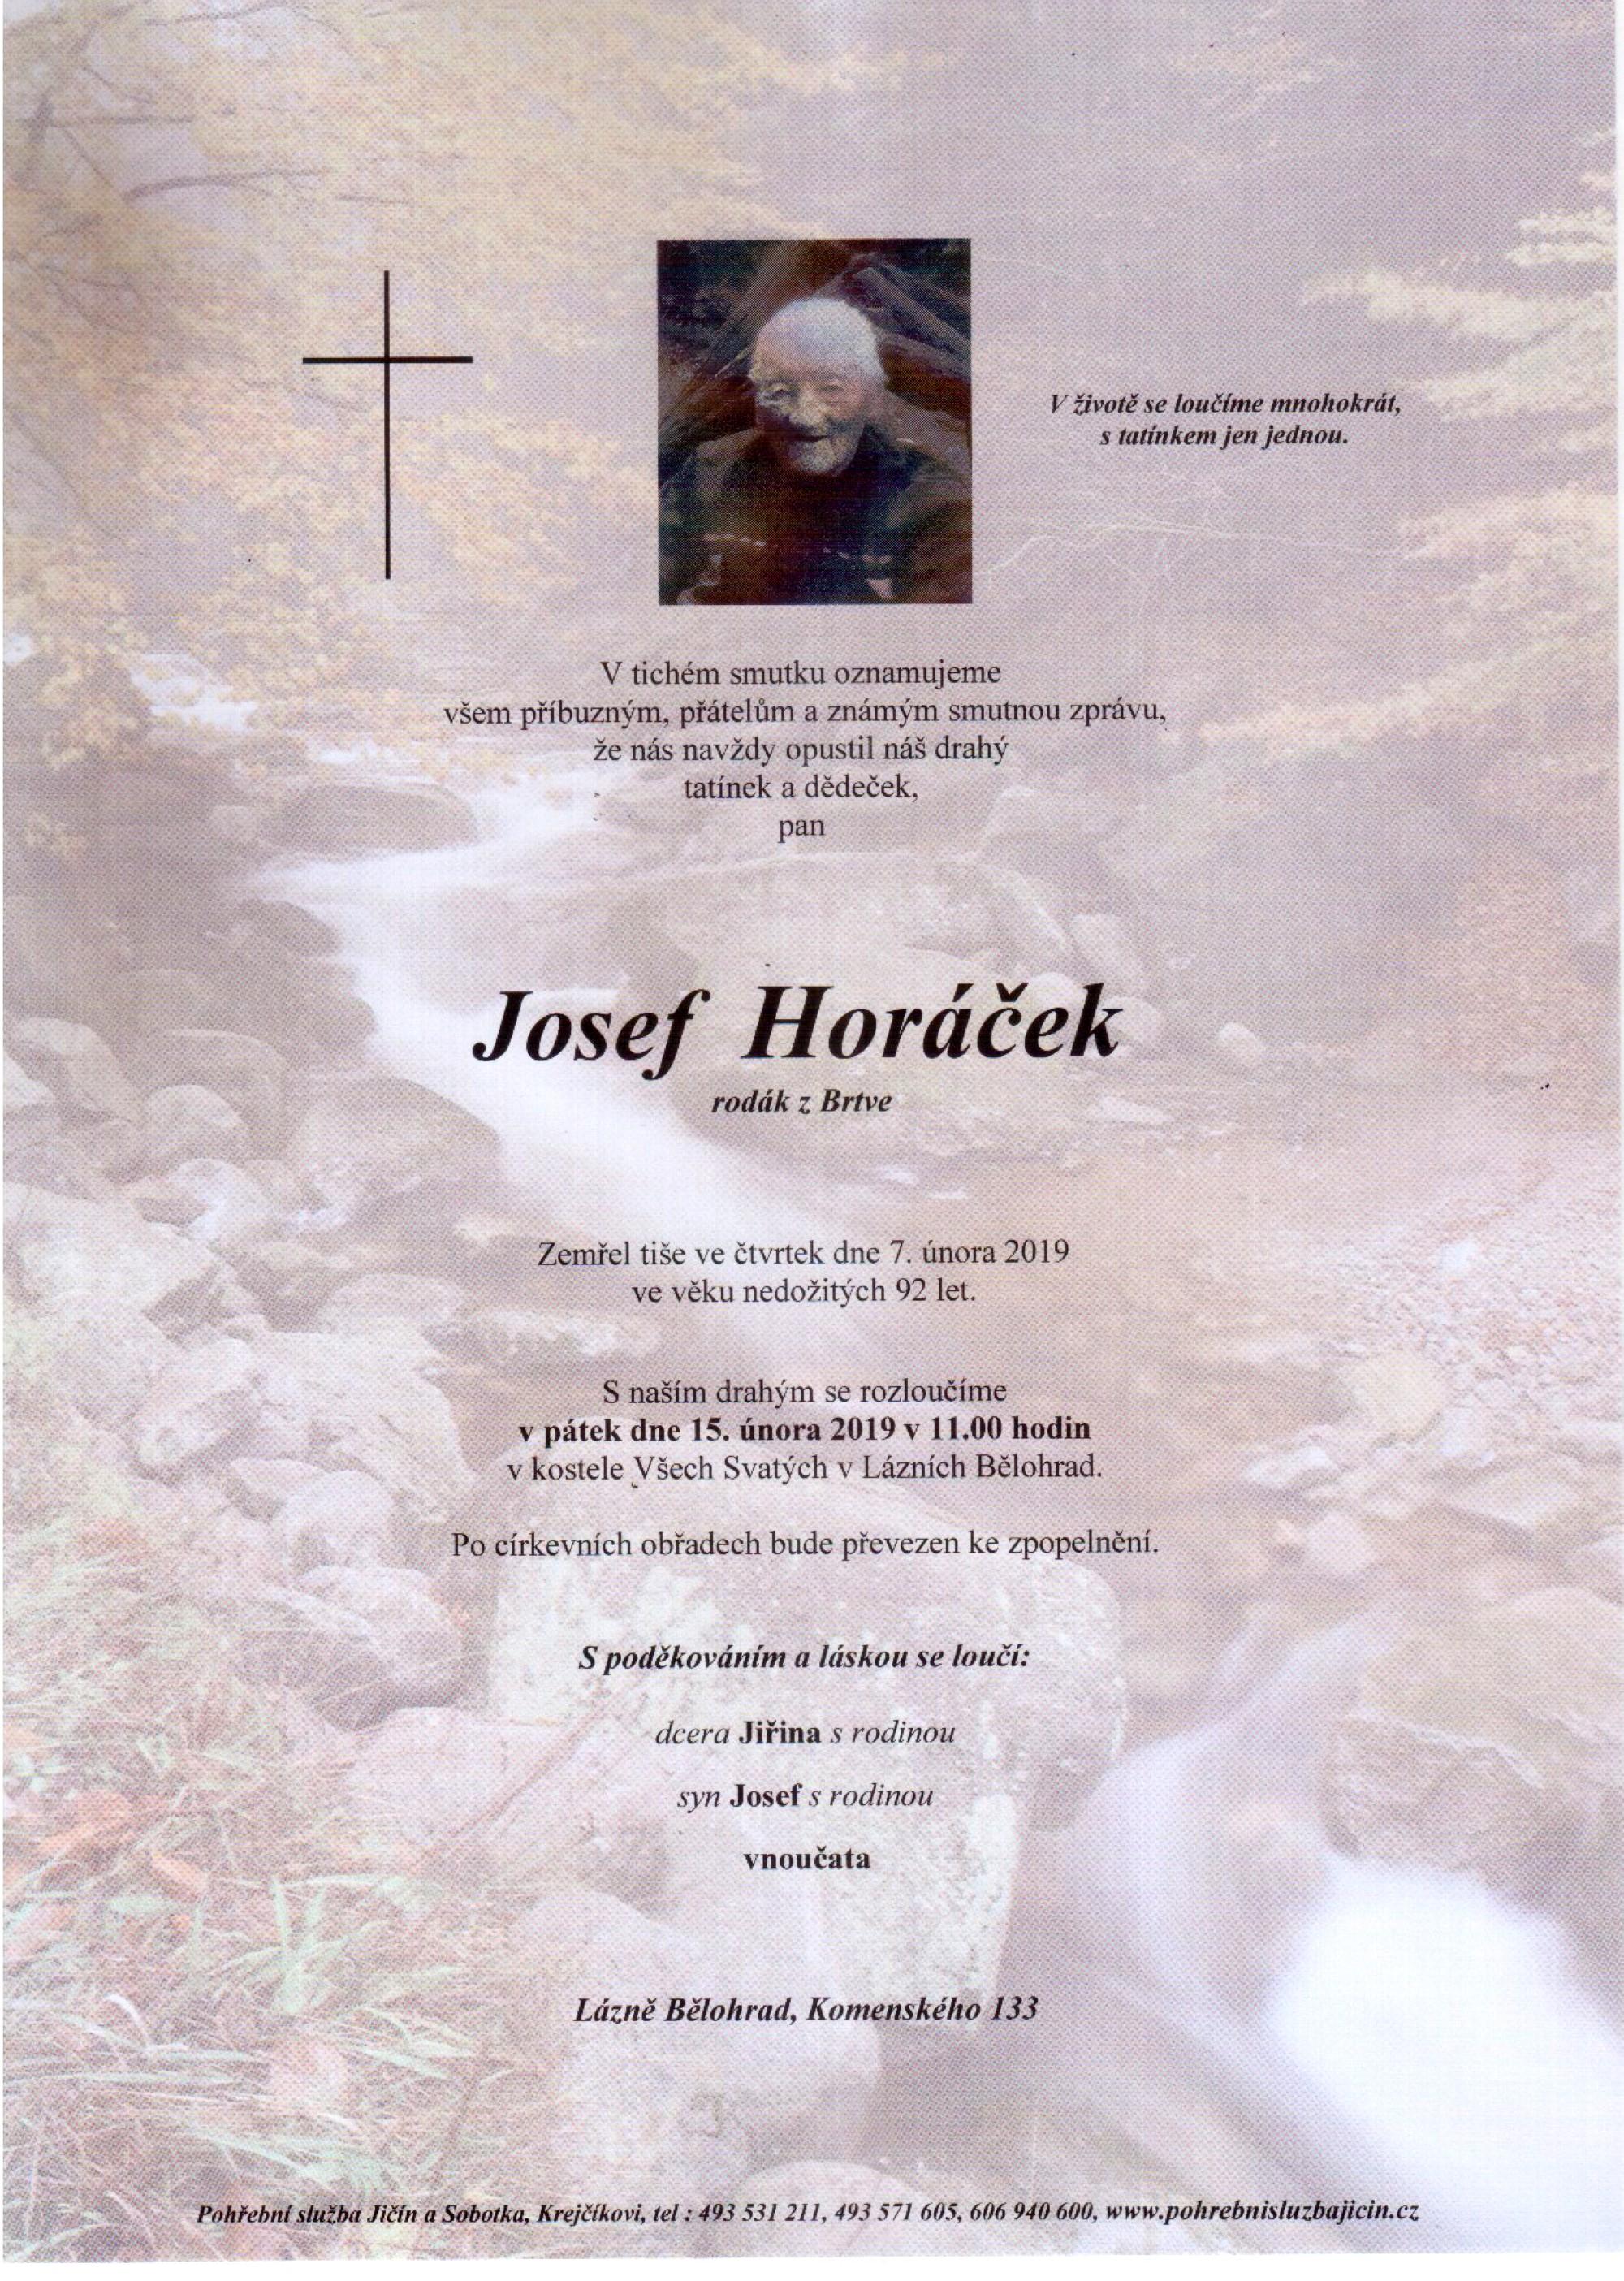 Josef Horáček